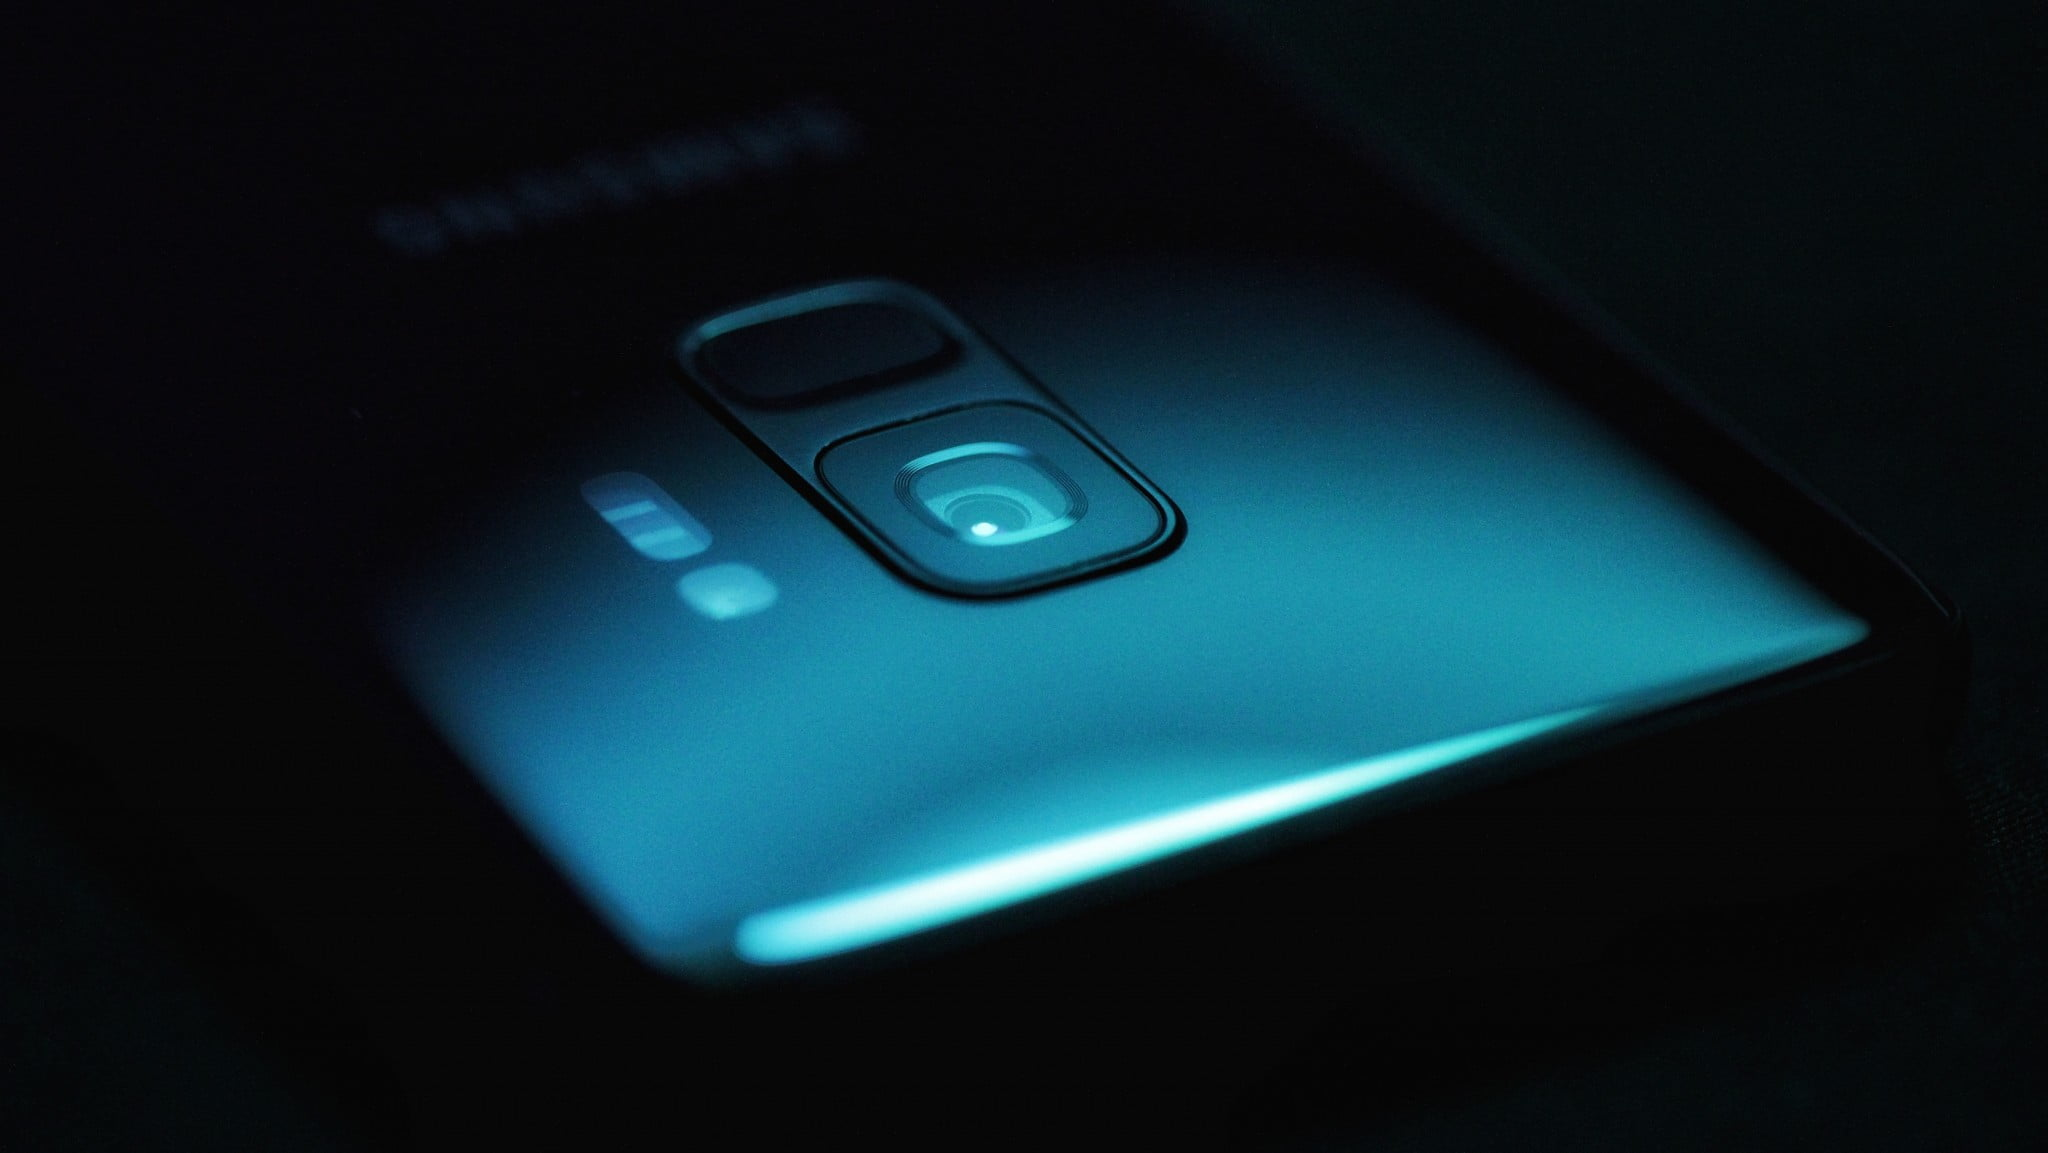 Samsung Galaxy S9 camera module picture